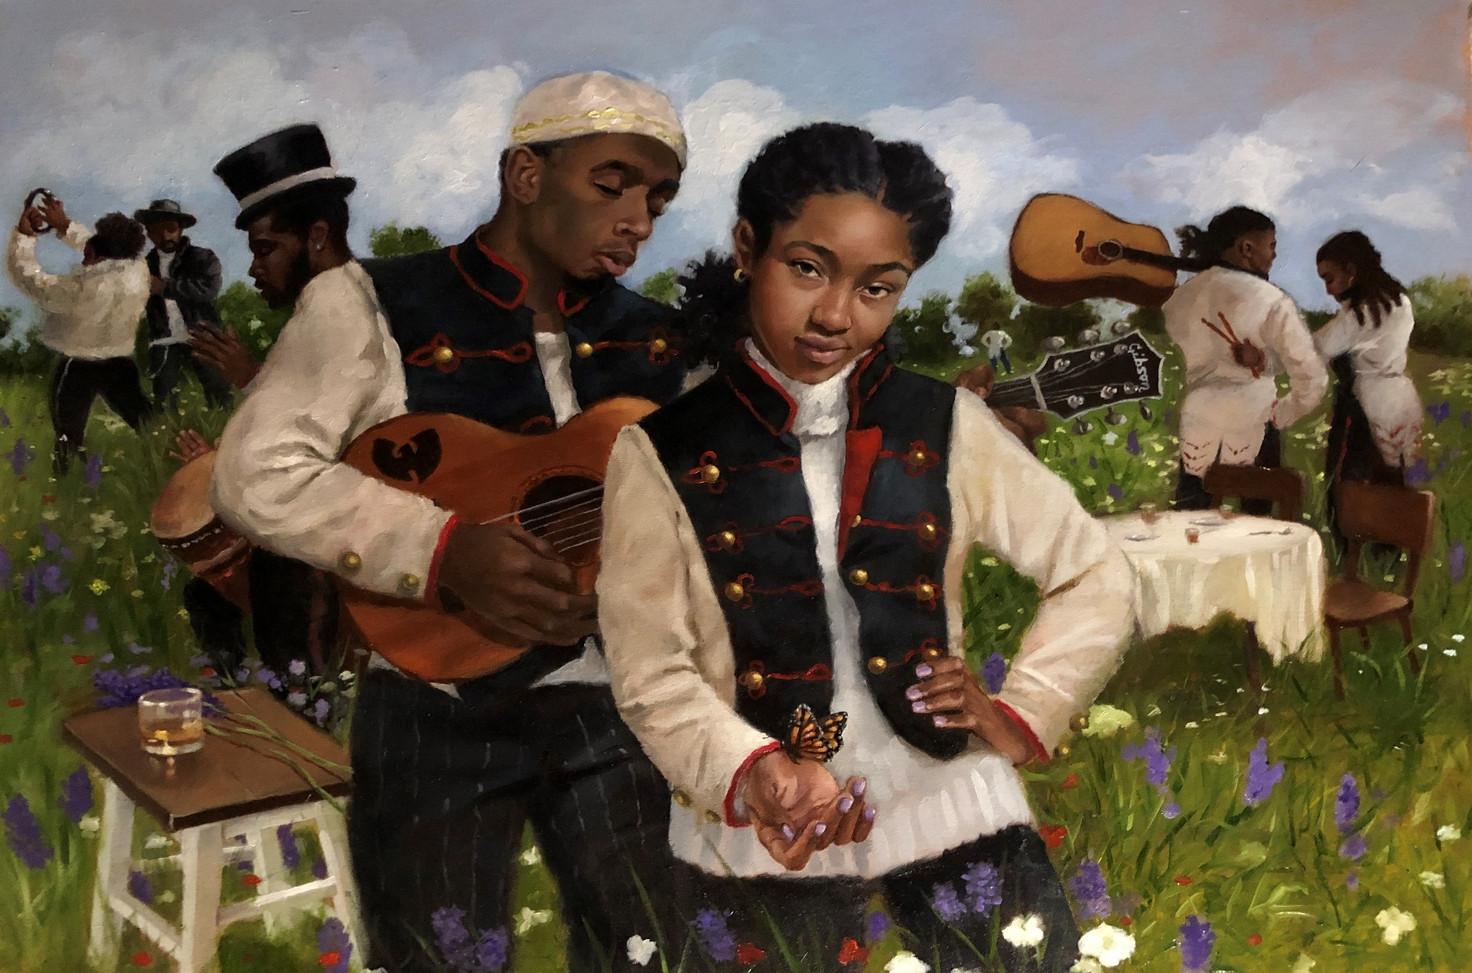 Jerry Jordan Lavender Park, 2020 Oil on canvas 30 x 40 inches